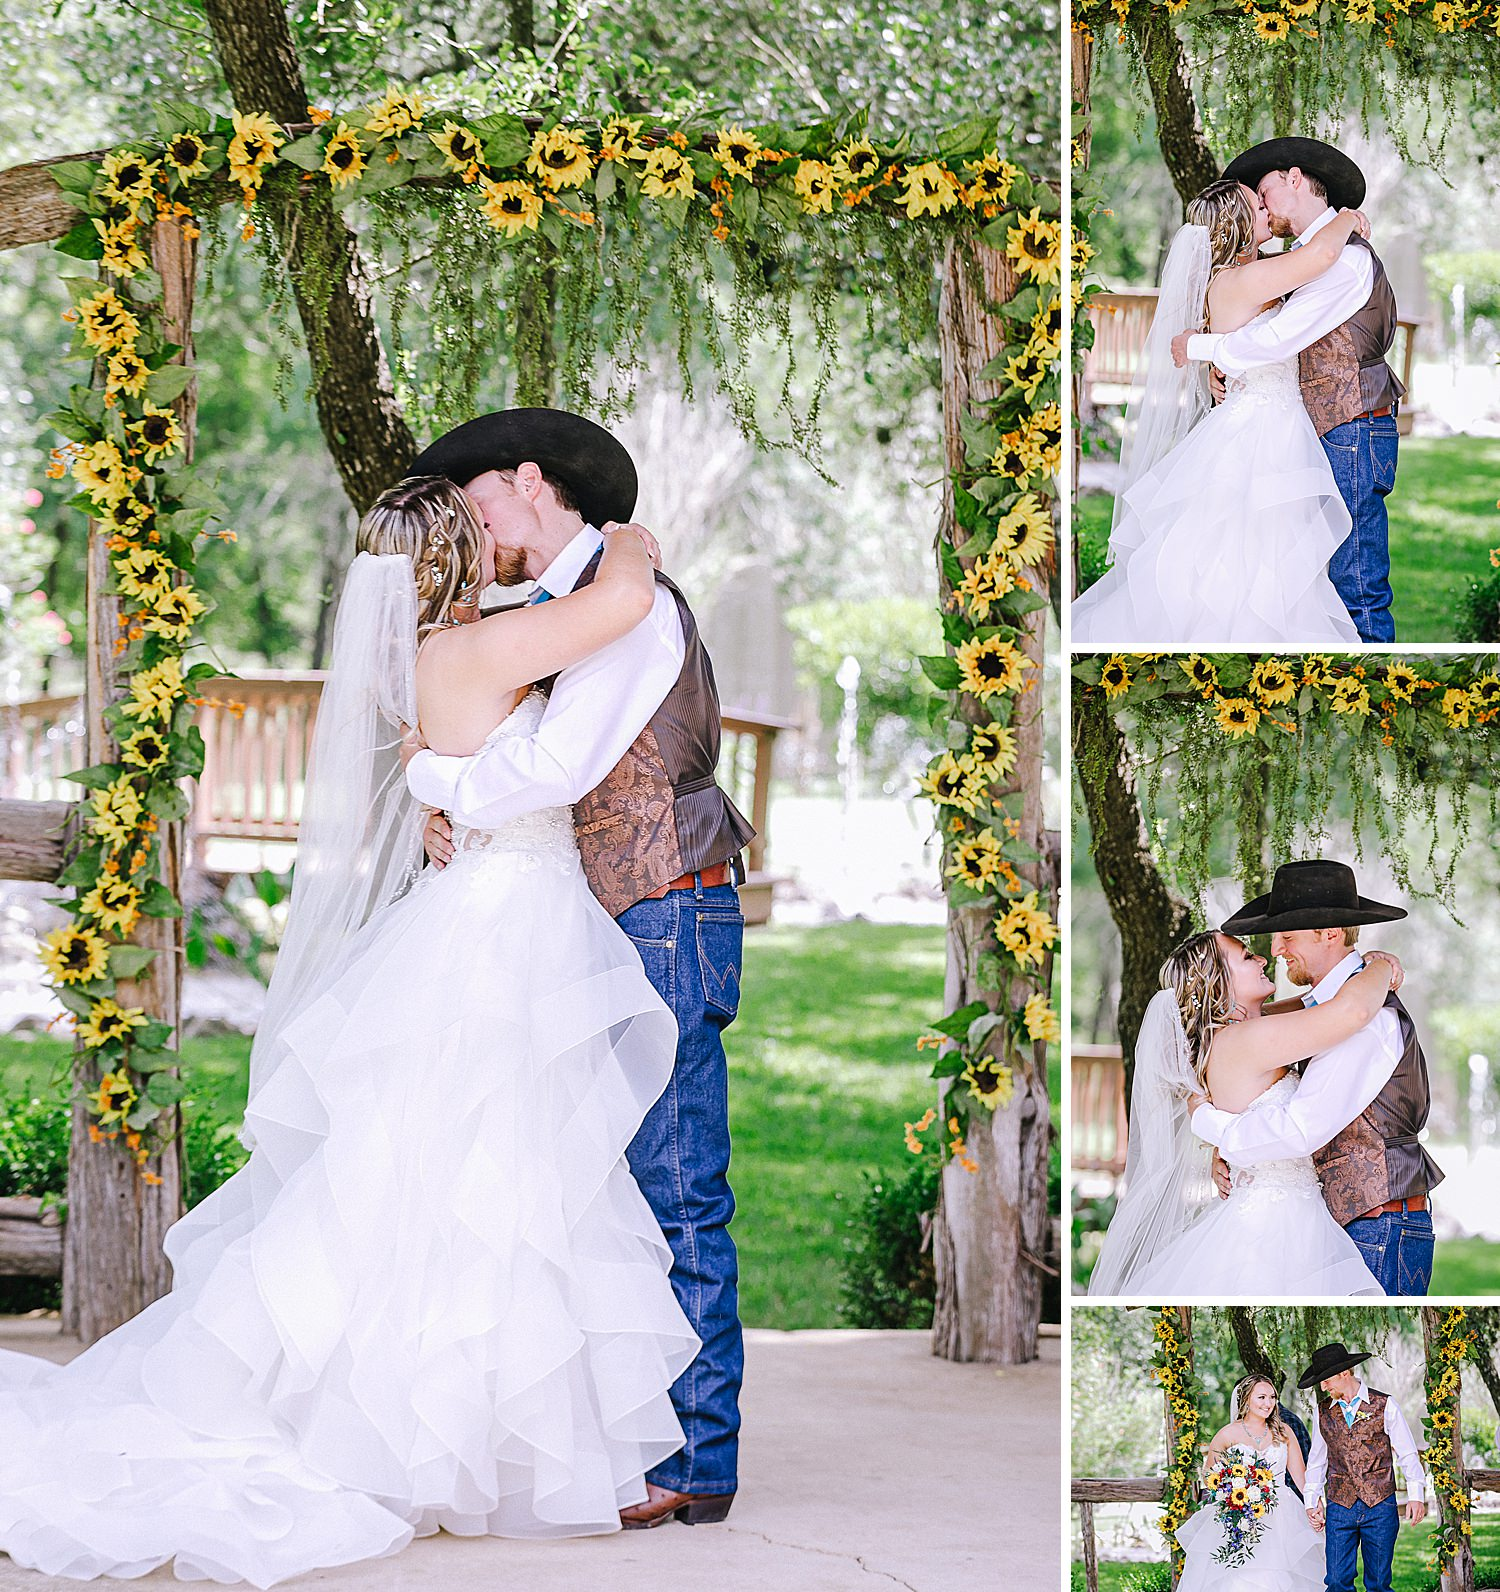 Carly-Barton-Photography-Old-Town-Texas-Rustic-Wedding-Photos-Sunflowers-Boots-Kyle-Texas_0043.jpg